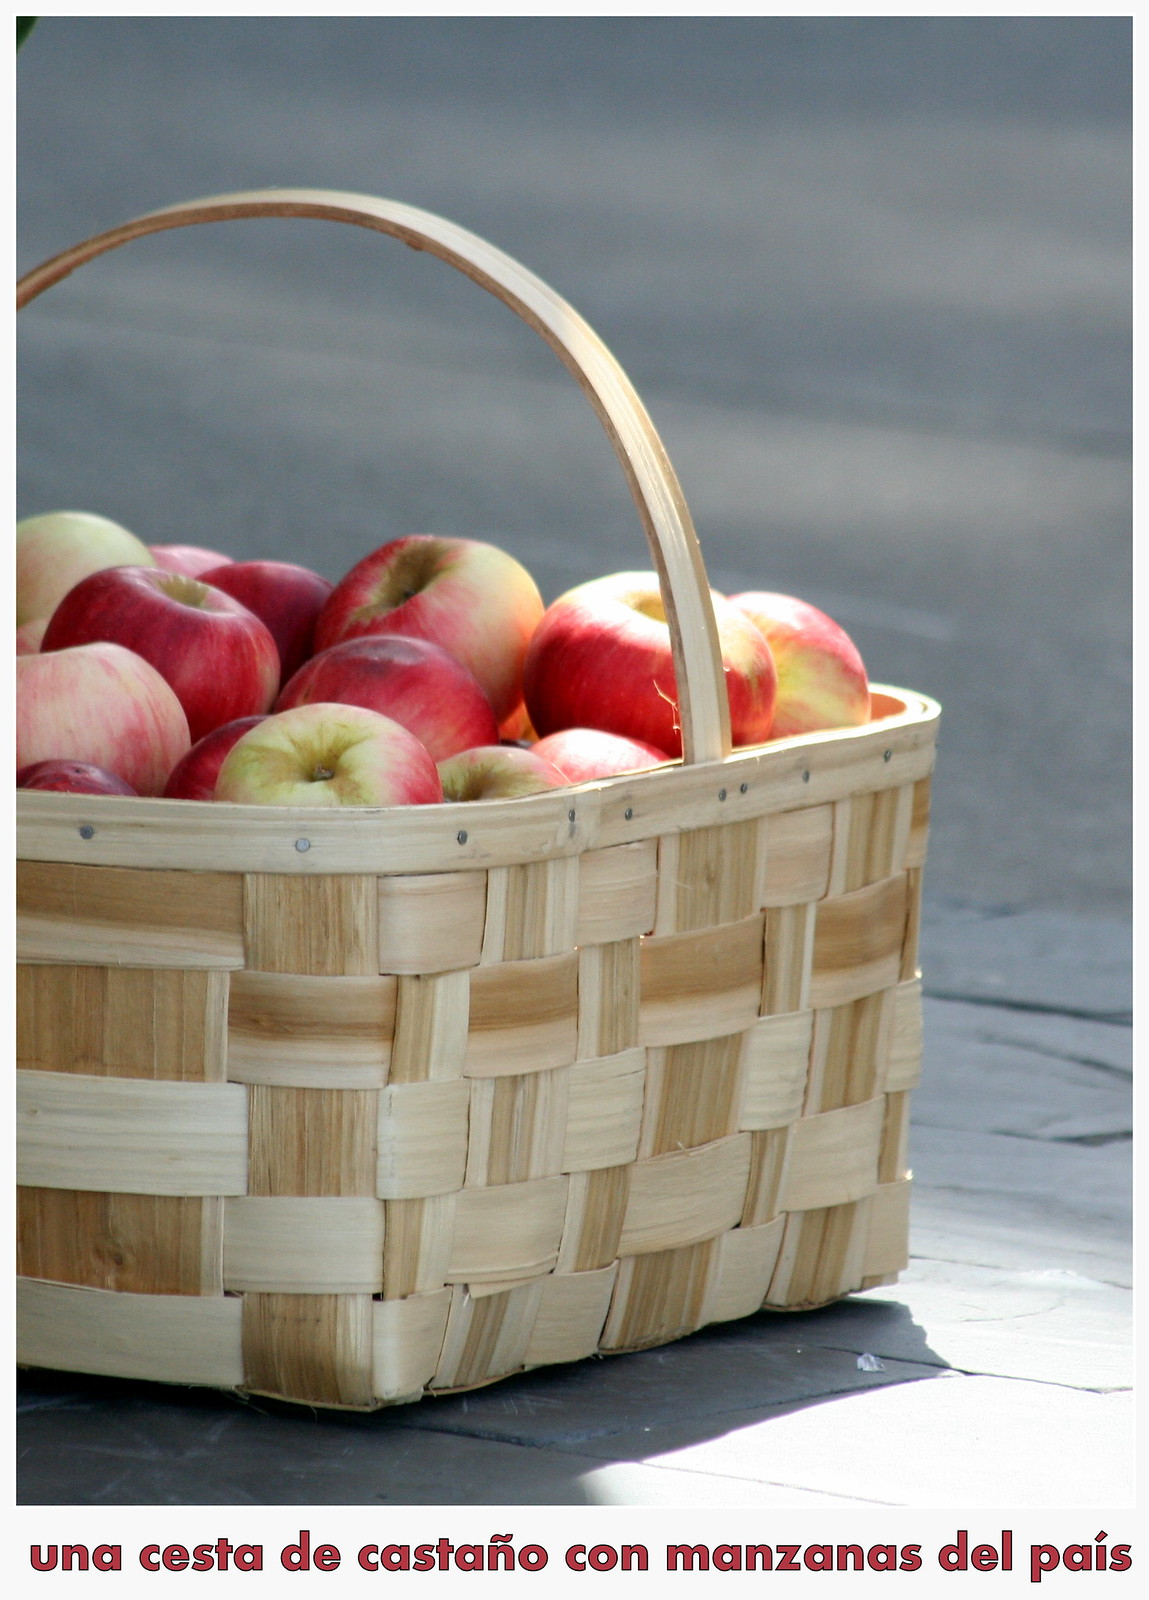 Manzanas en cesta